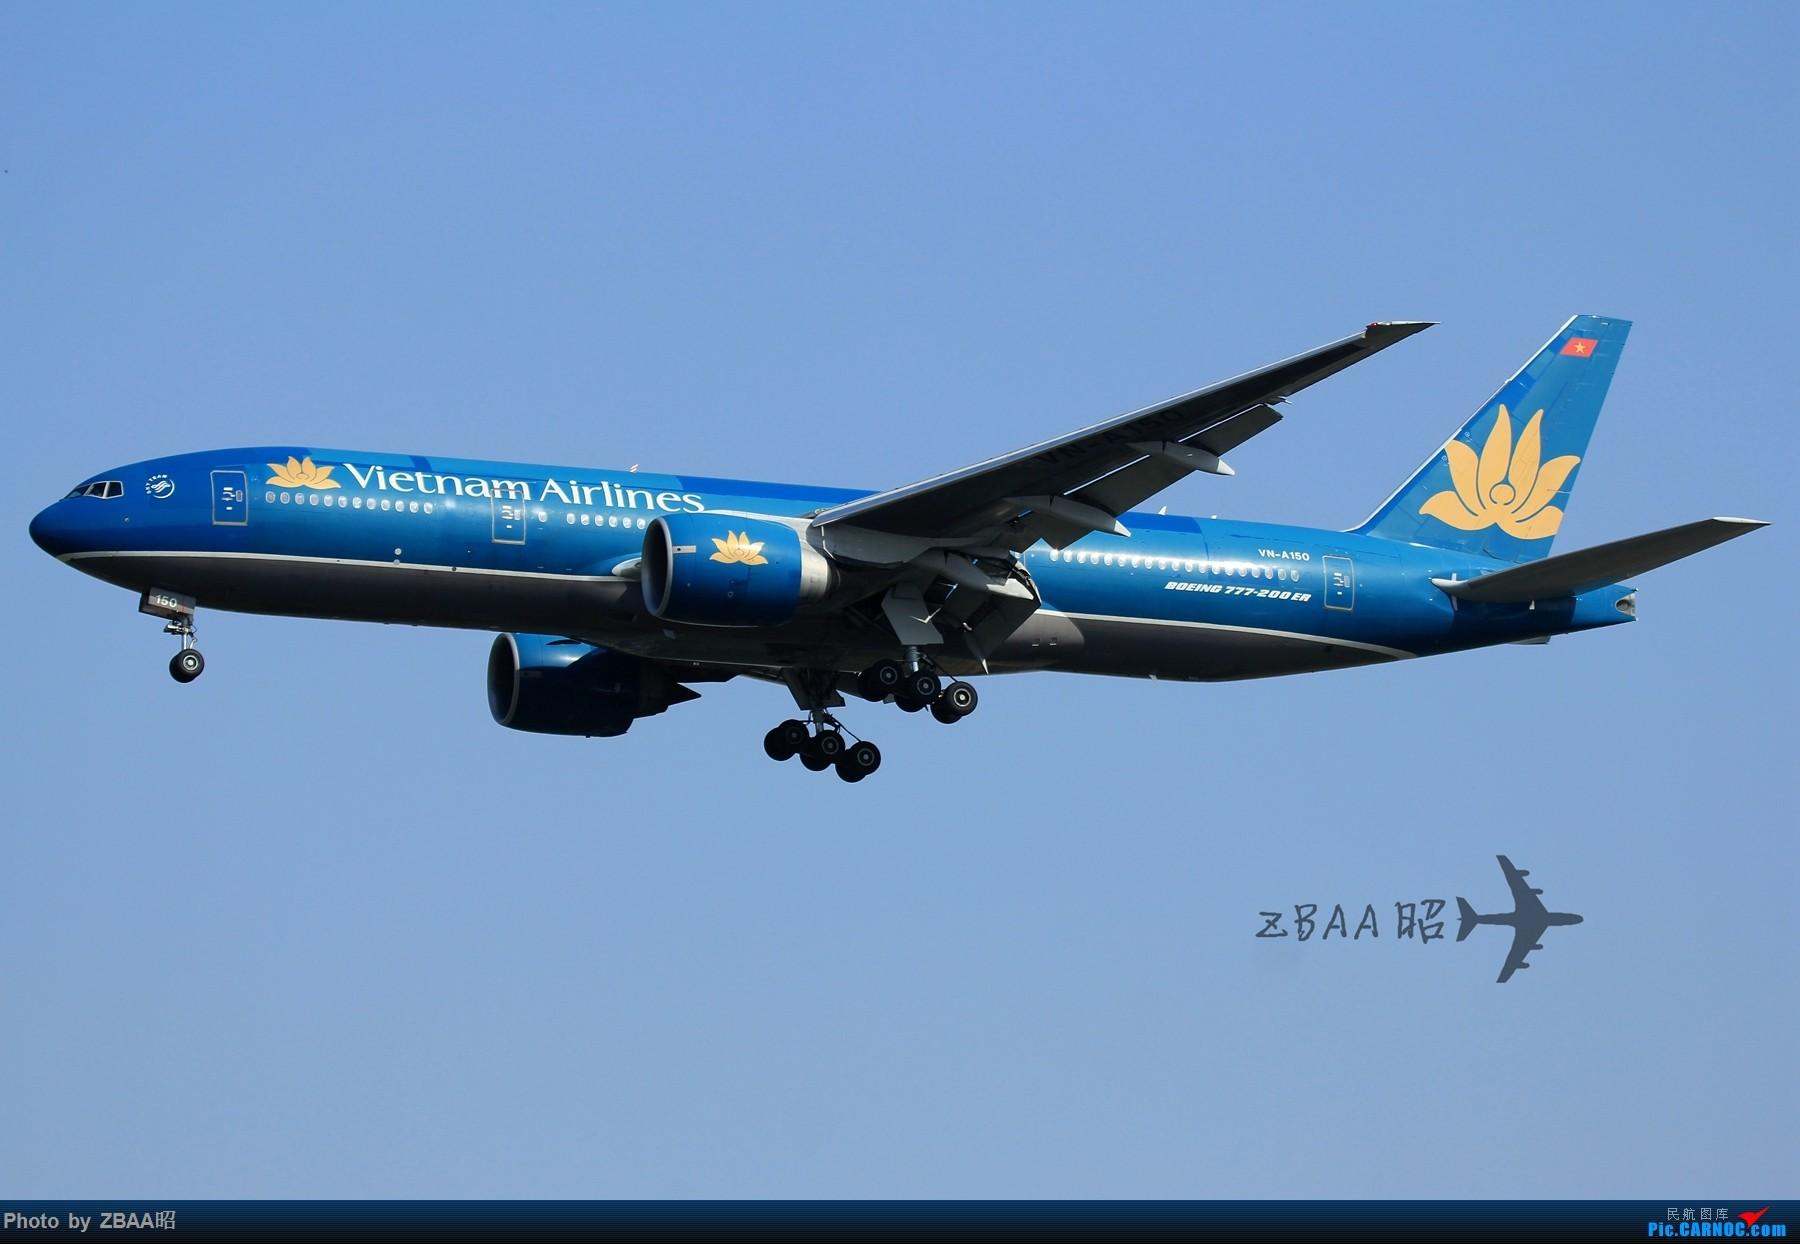 Re:[原创]今日ZBAA 36R跑道接连三枚好货:南航天合 越南772 美联772星星 BOEING 777-200 VN-A150 中国北京首都国际机场